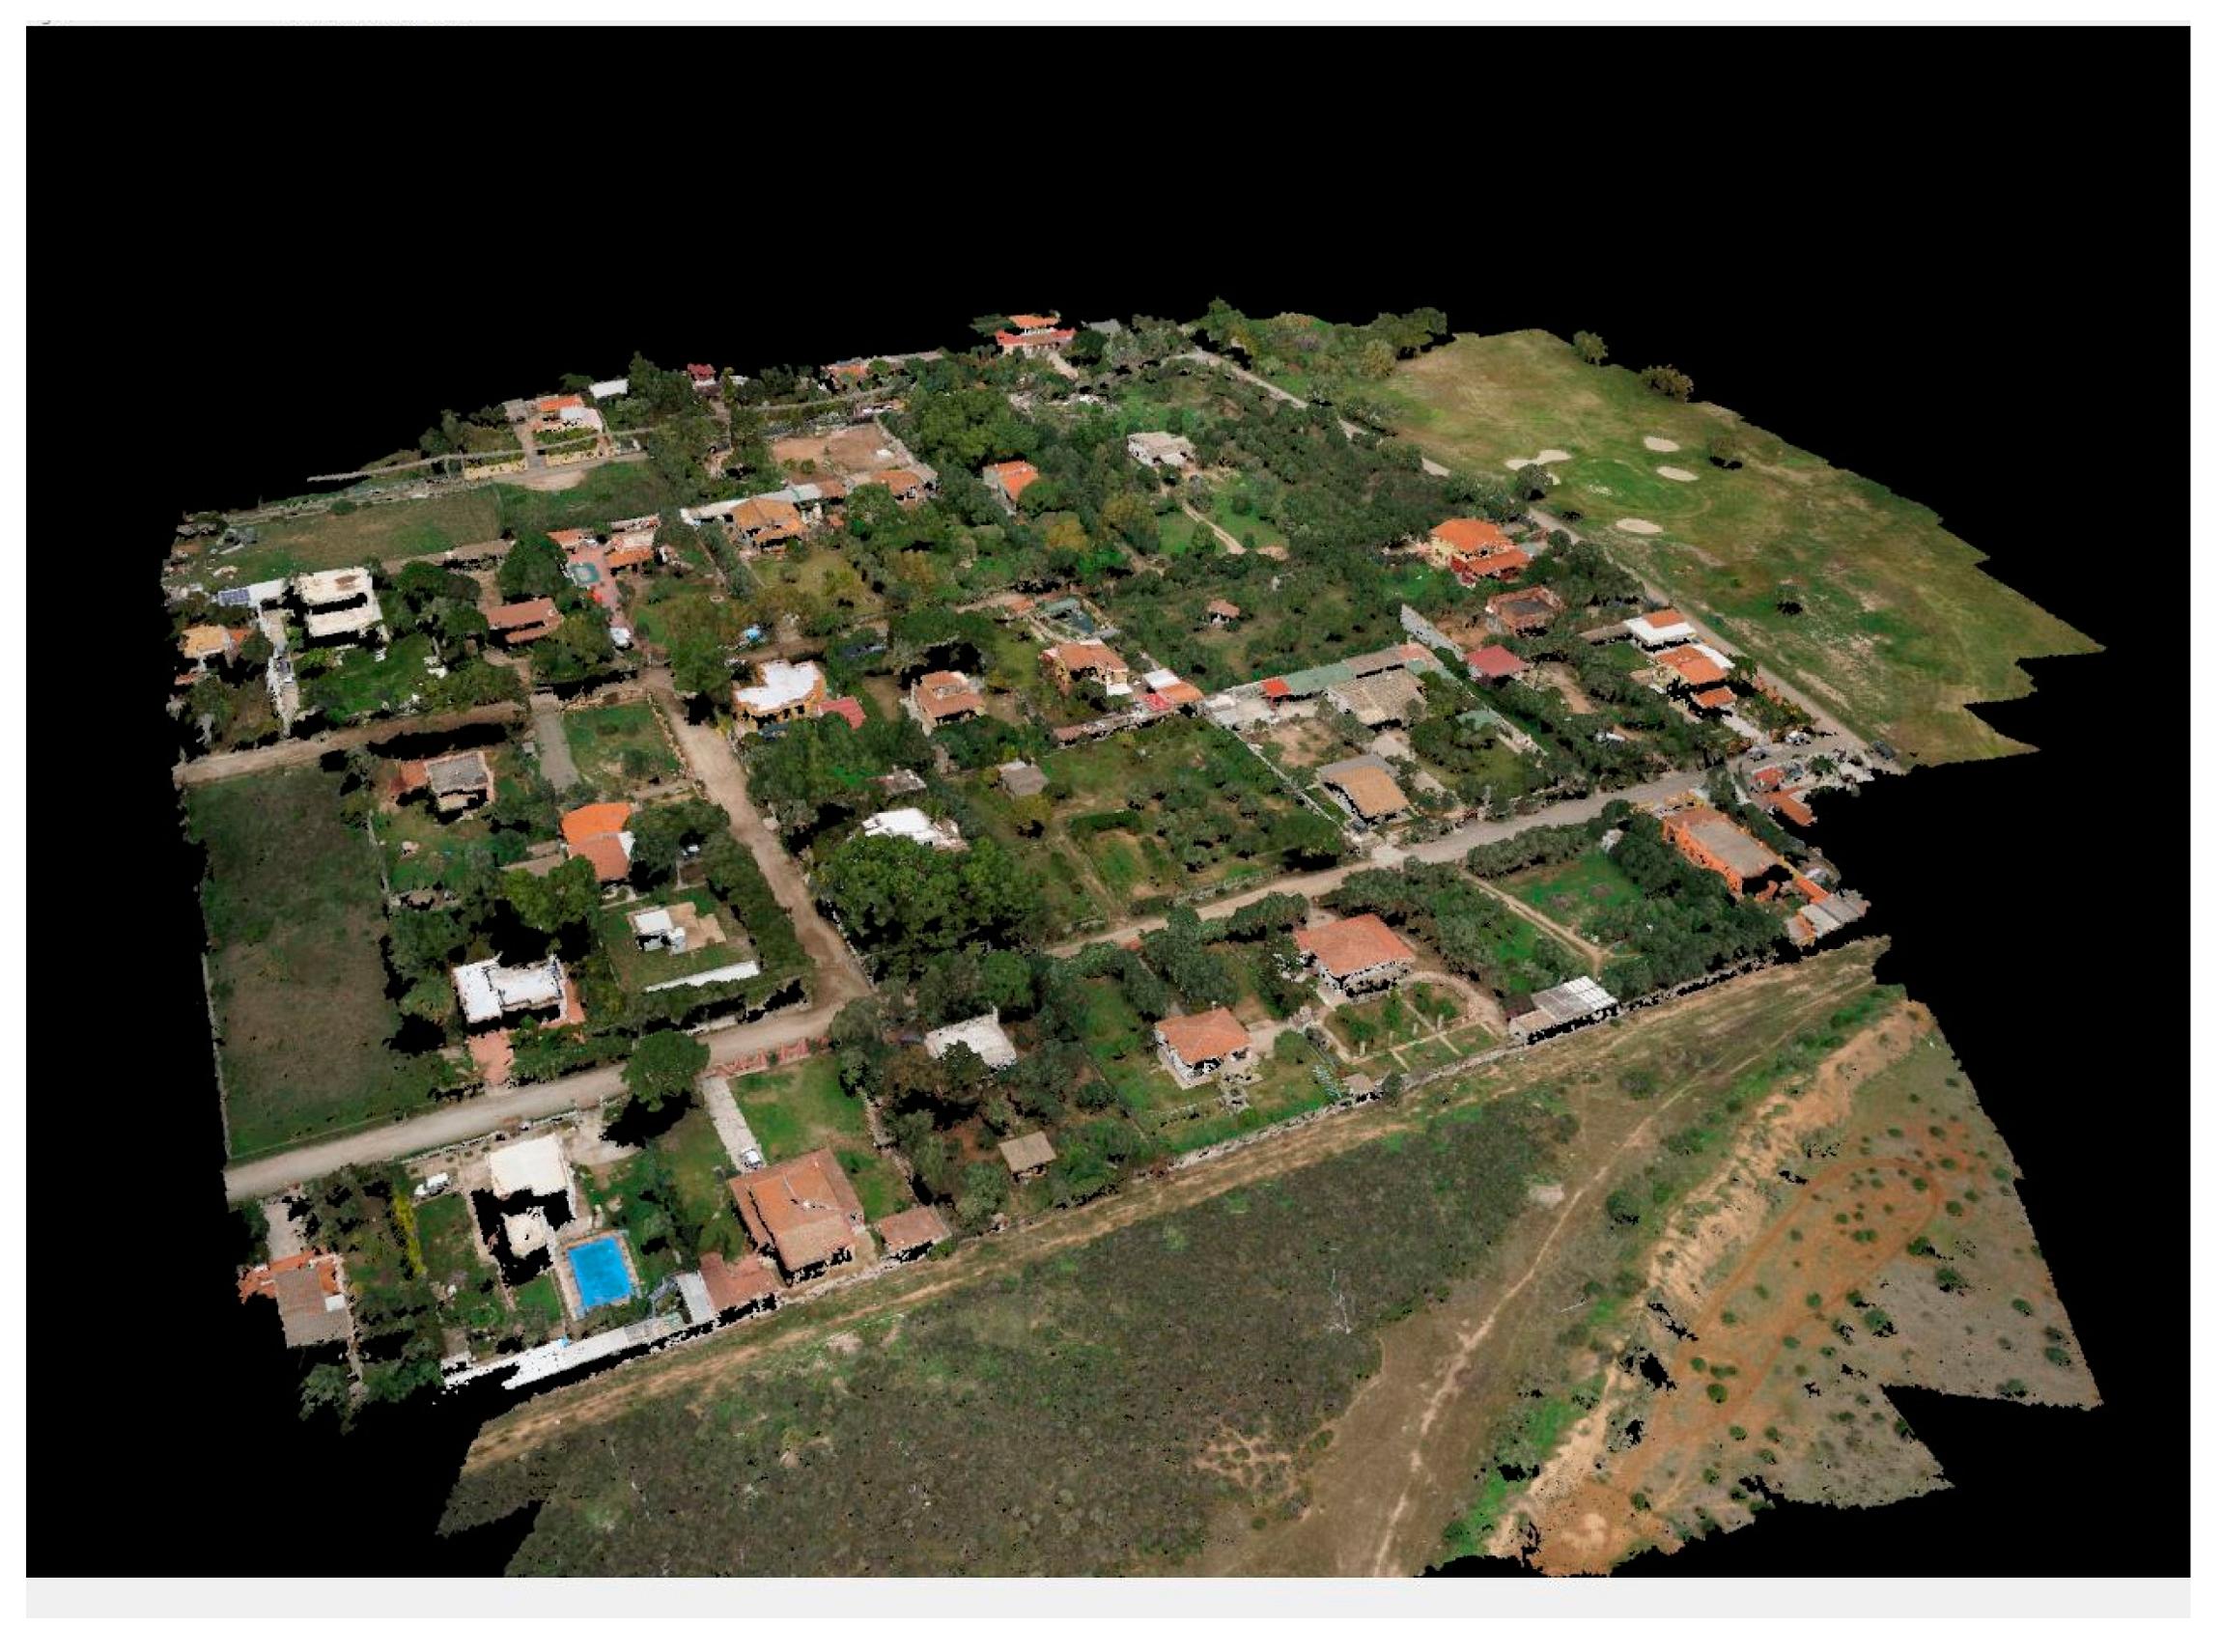 IJGI | Free Full-Text | The Use of Nadir and Oblique UAV